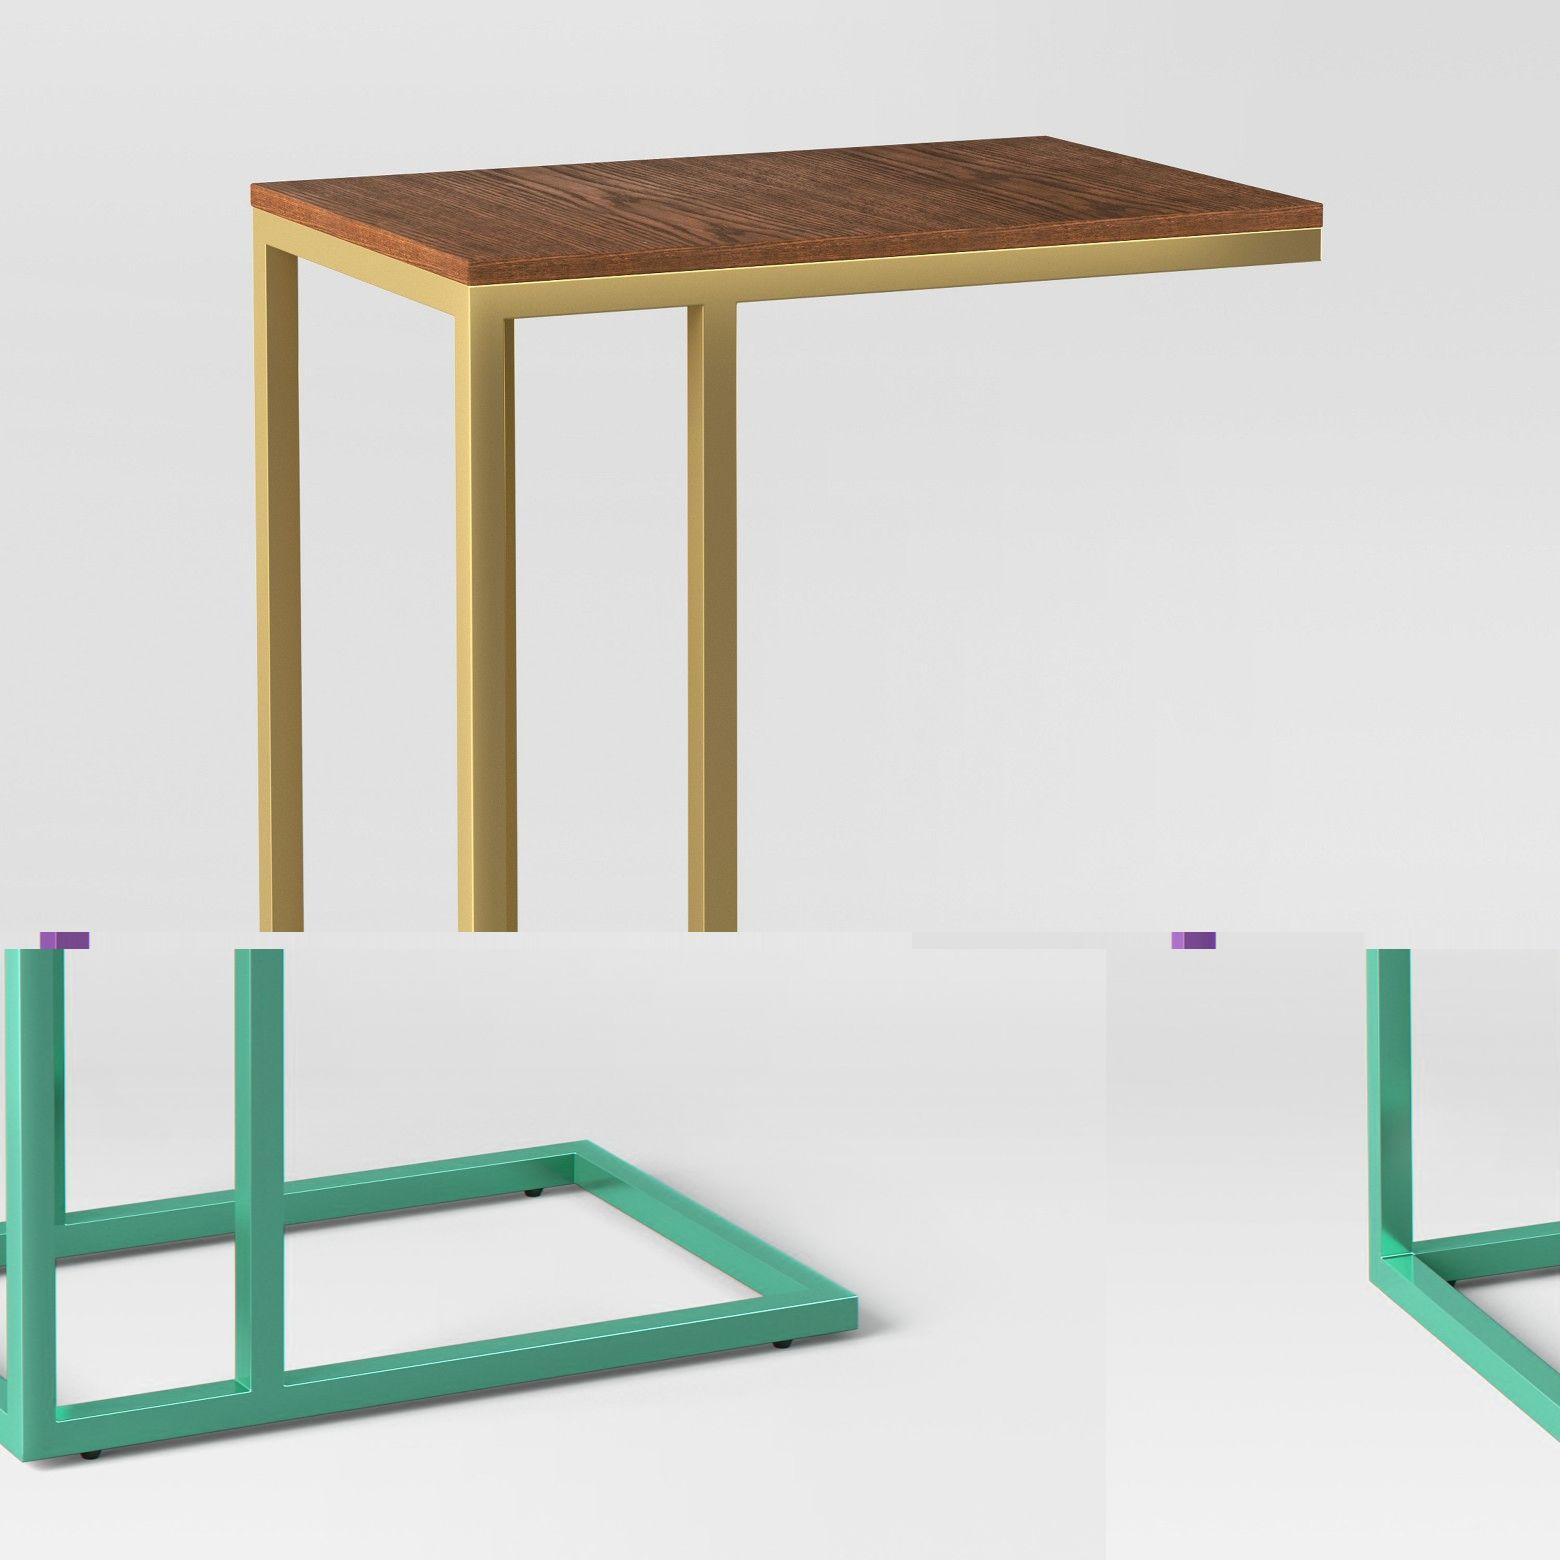 Antwerp C Table Walnut Project 62 Target C Table Blue